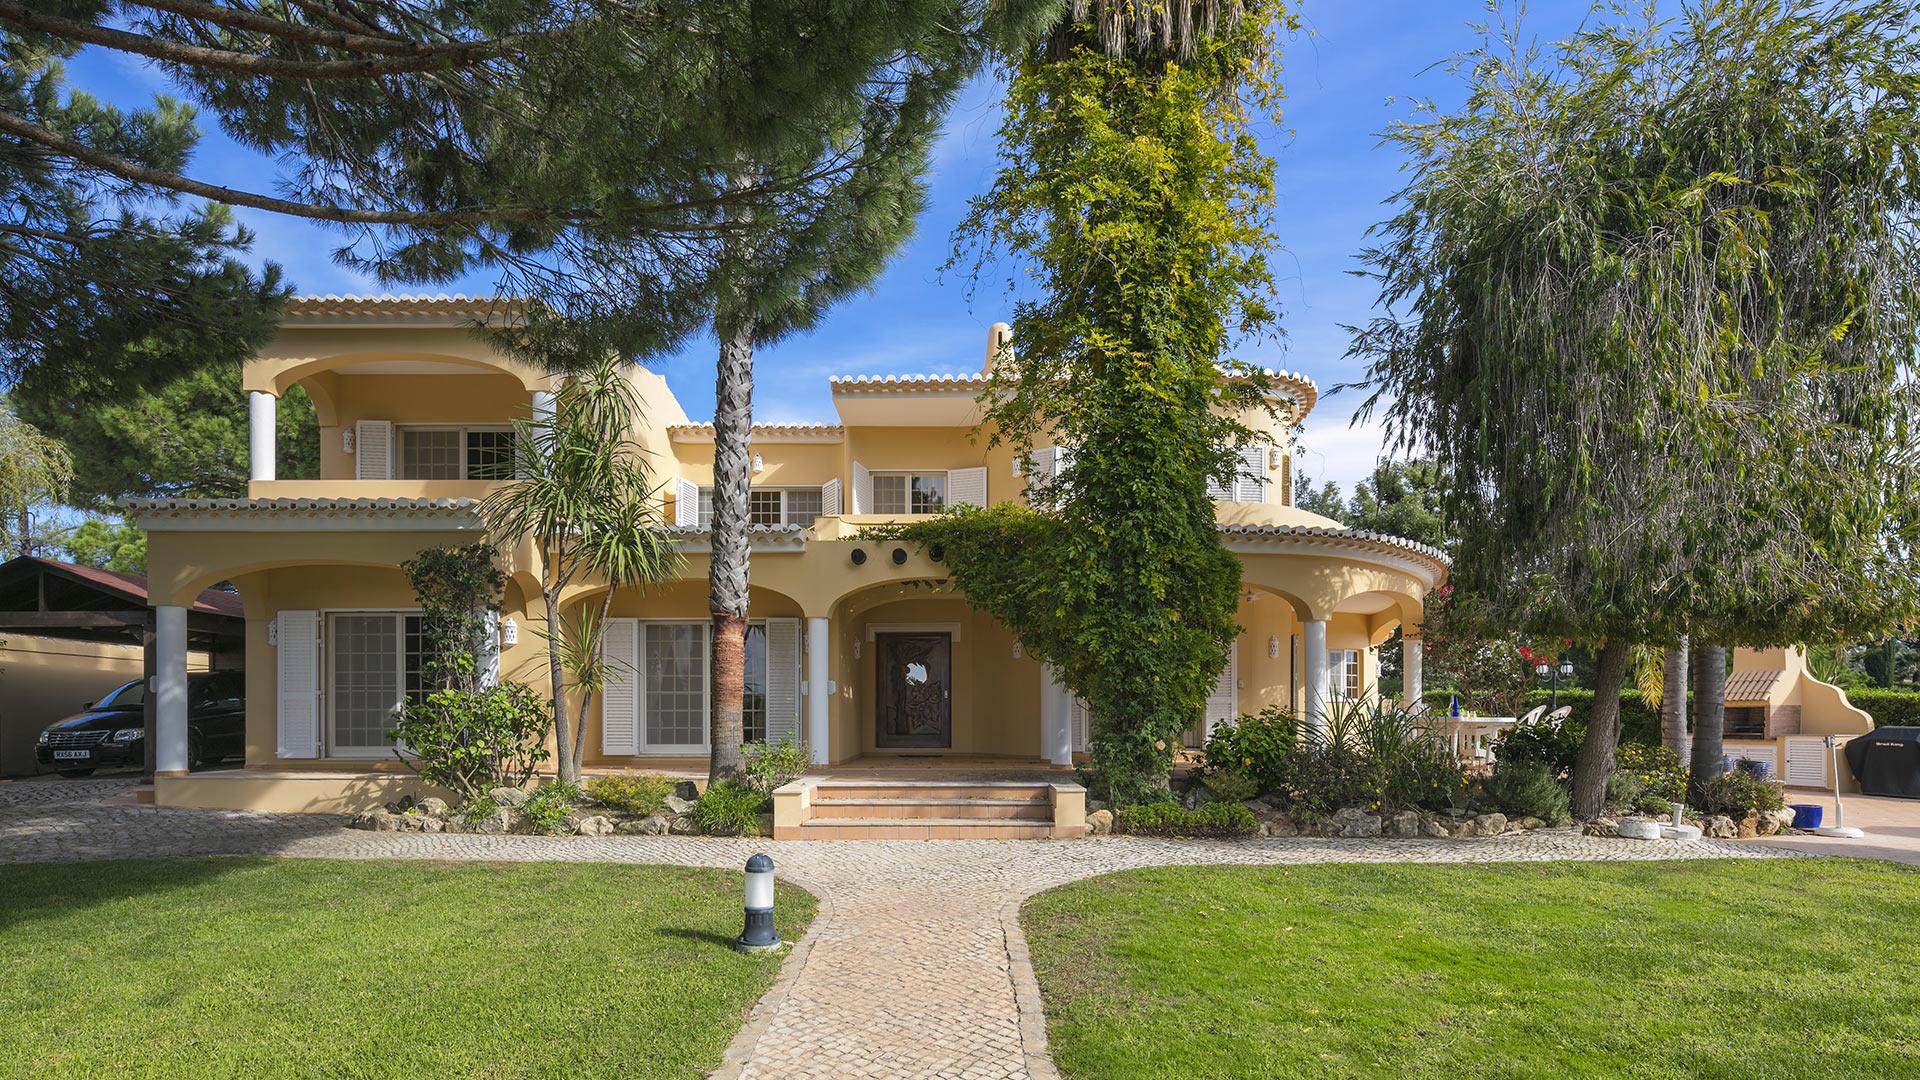 villa mooria villa mieten in algarve almancil villanovo. Black Bedroom Furniture Sets. Home Design Ideas